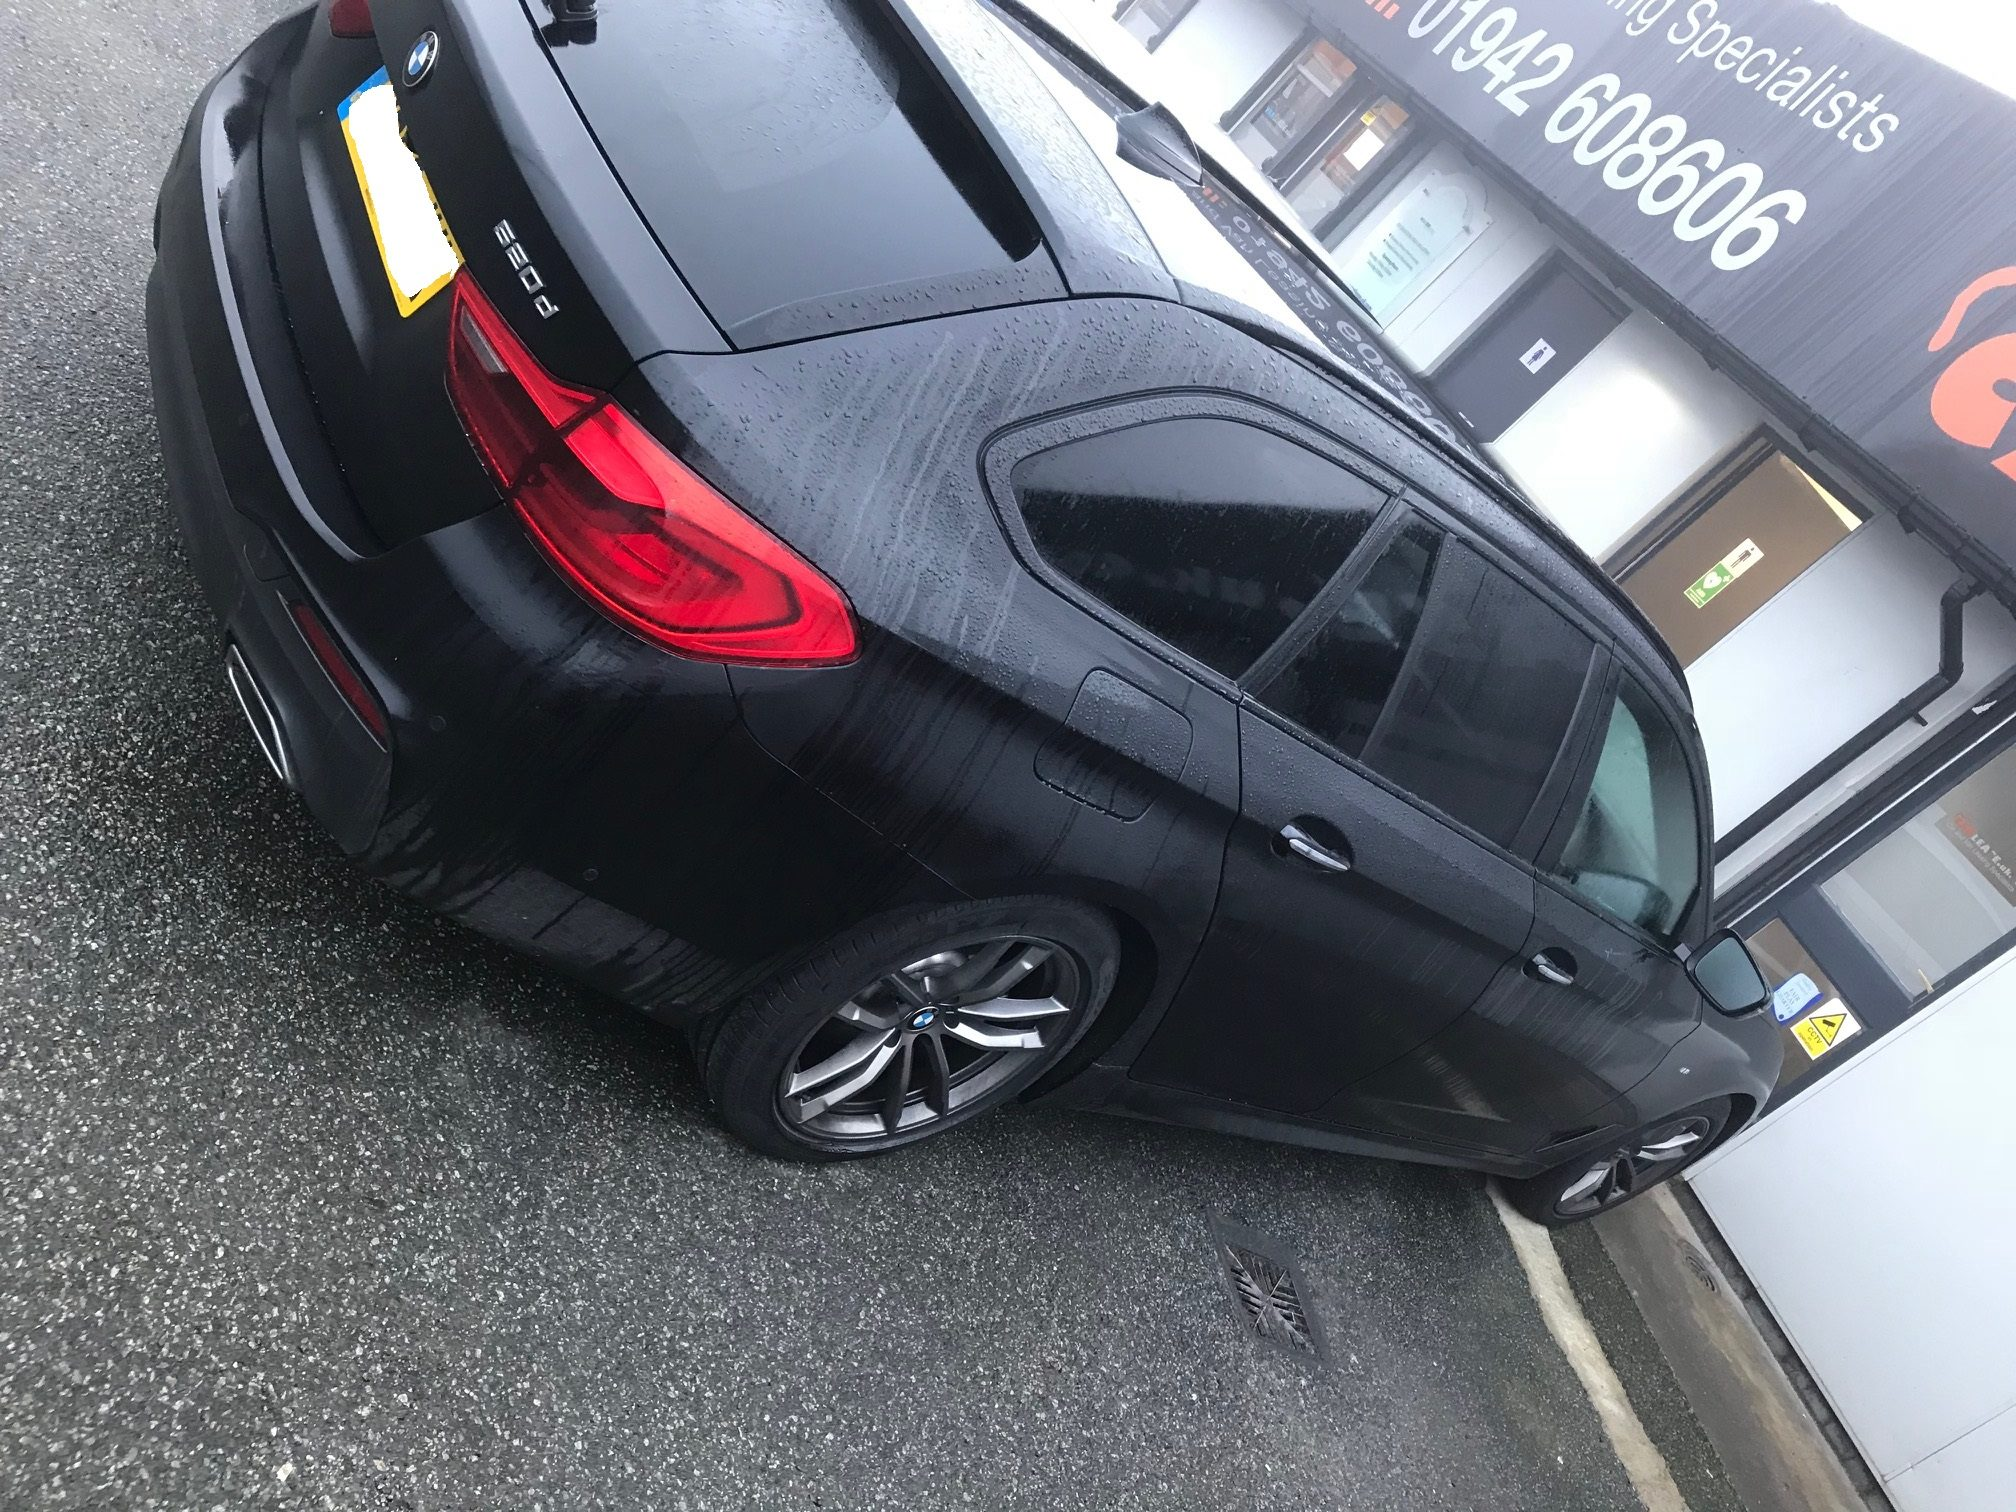 BMW 5 SERIES DIESEL TOURING 520d M Sport 5dr Auto Car Leasing Information